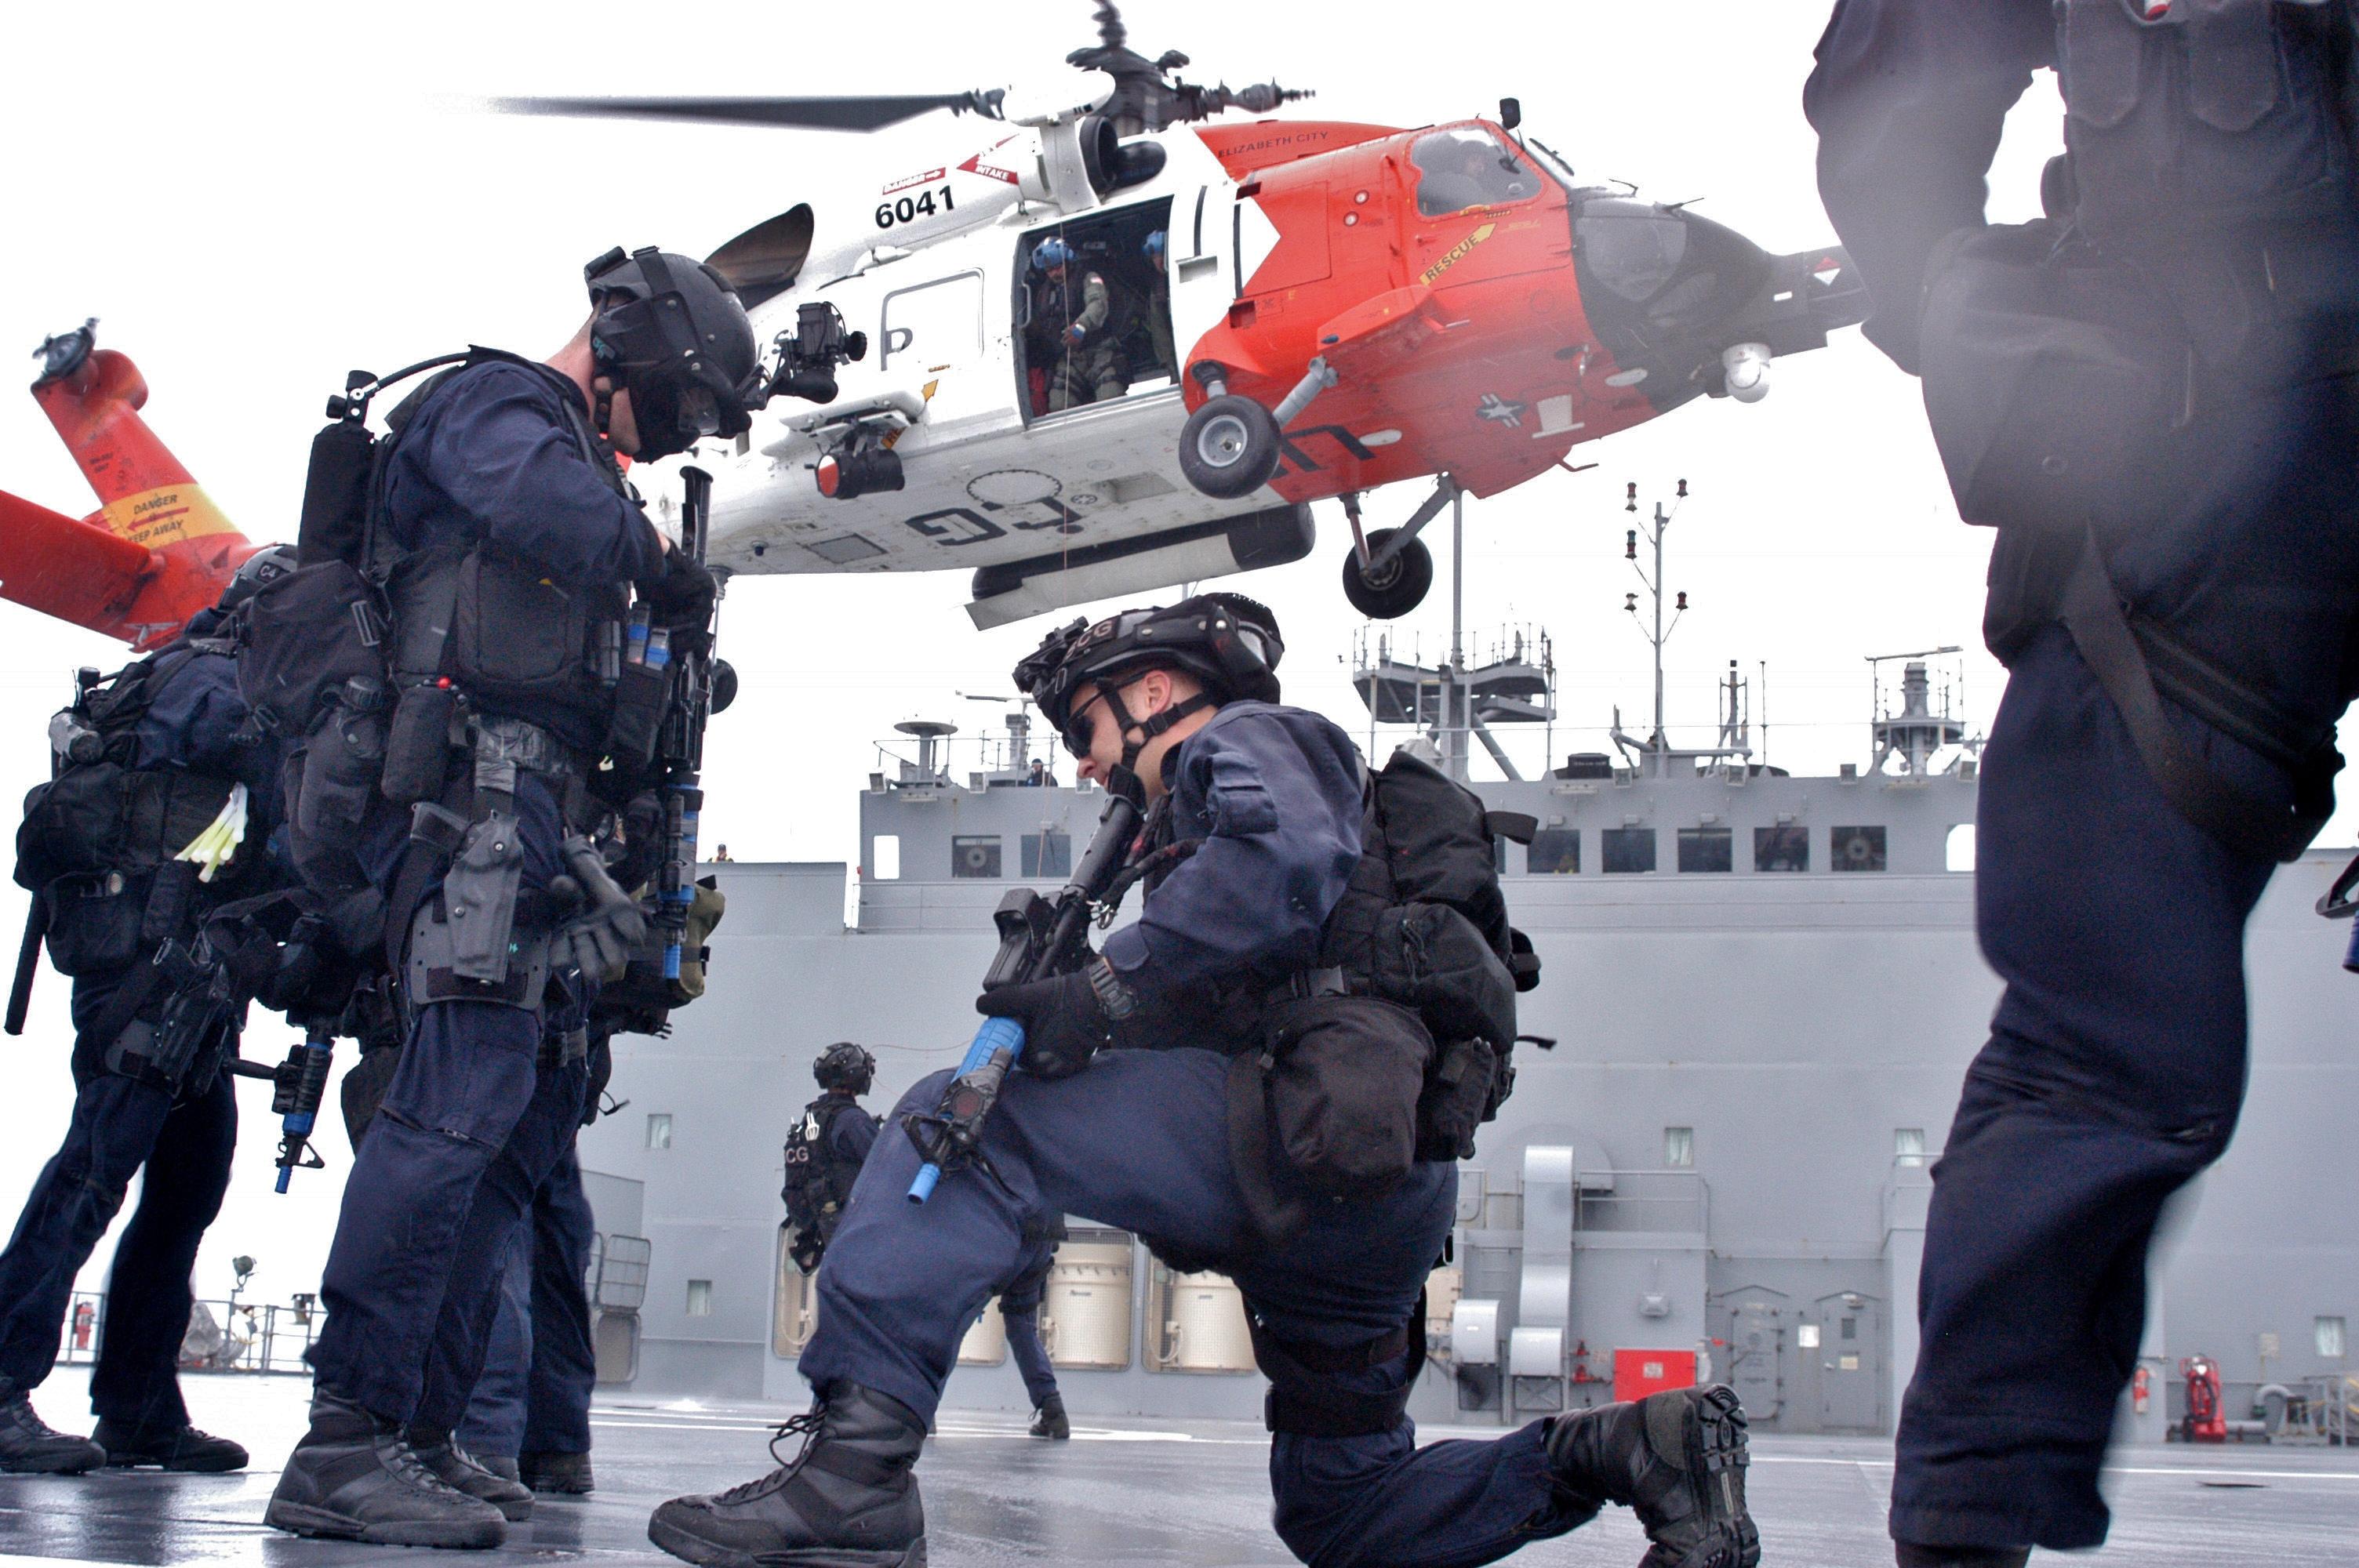 U.S._Coast_Guard_Maritime_Security_Response_Team_USNS_Sisler_2006.jpg